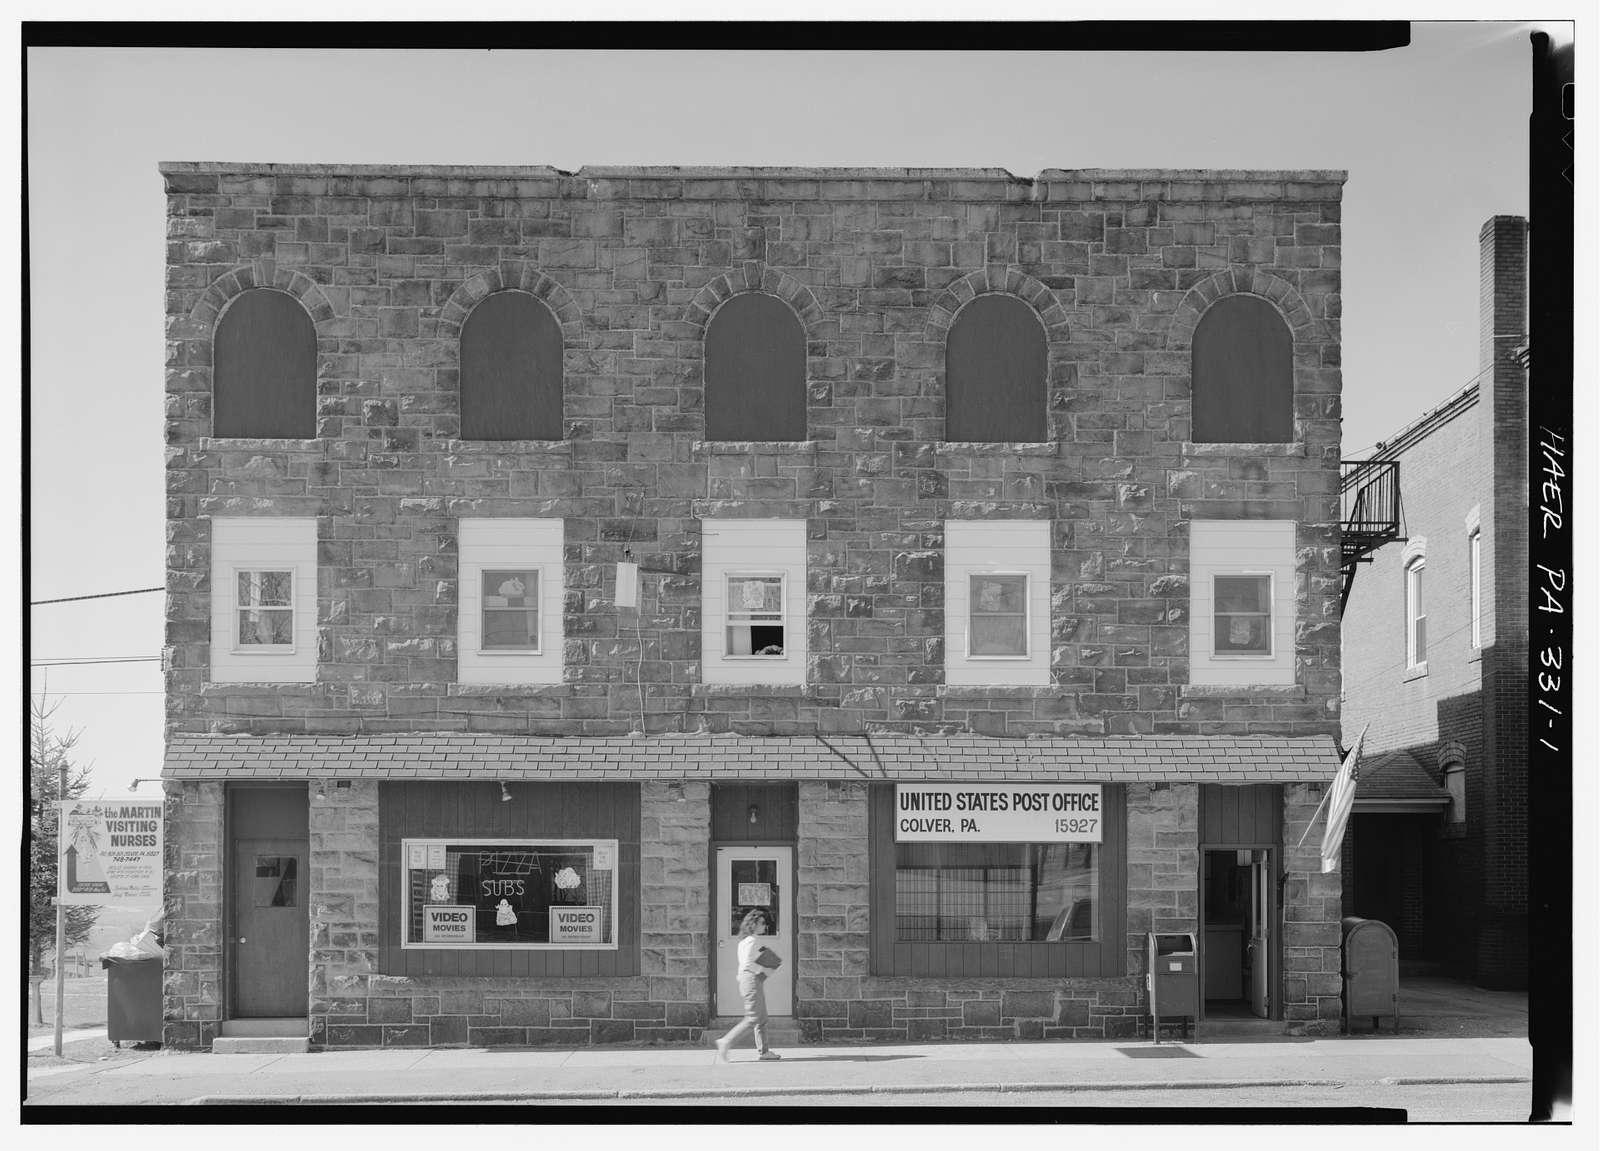 Ebensburg Coal Company, Office, Reese Avenue, Colver, Cambria County, PA